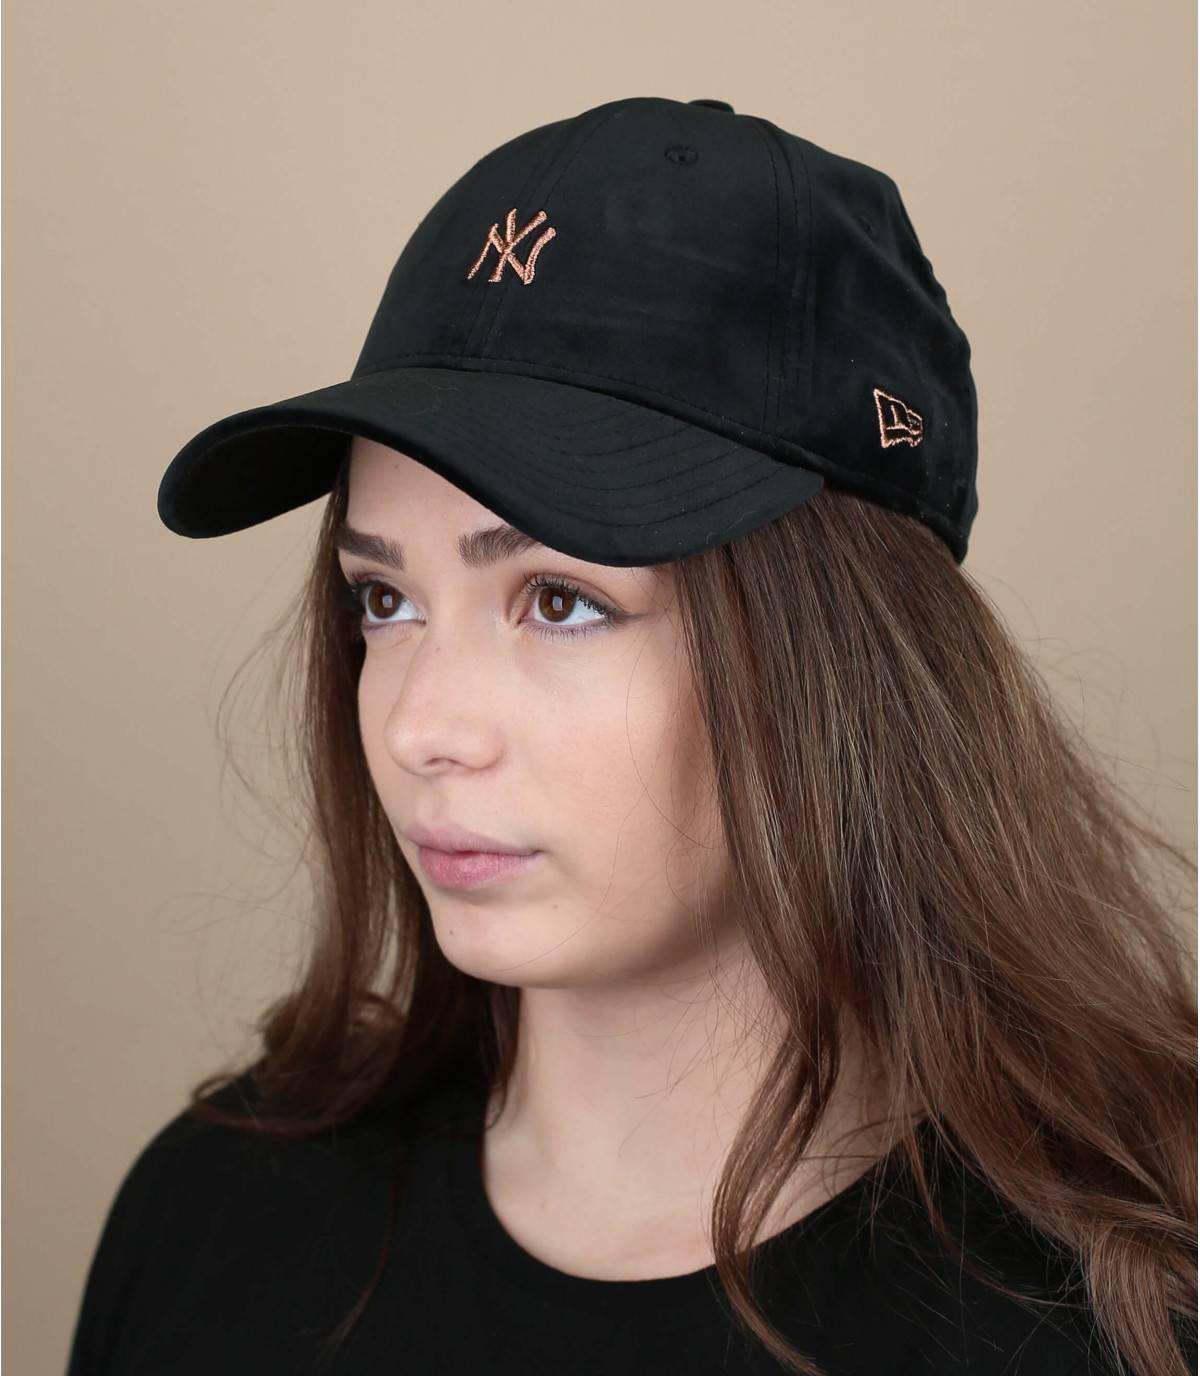 gorra mujer negra